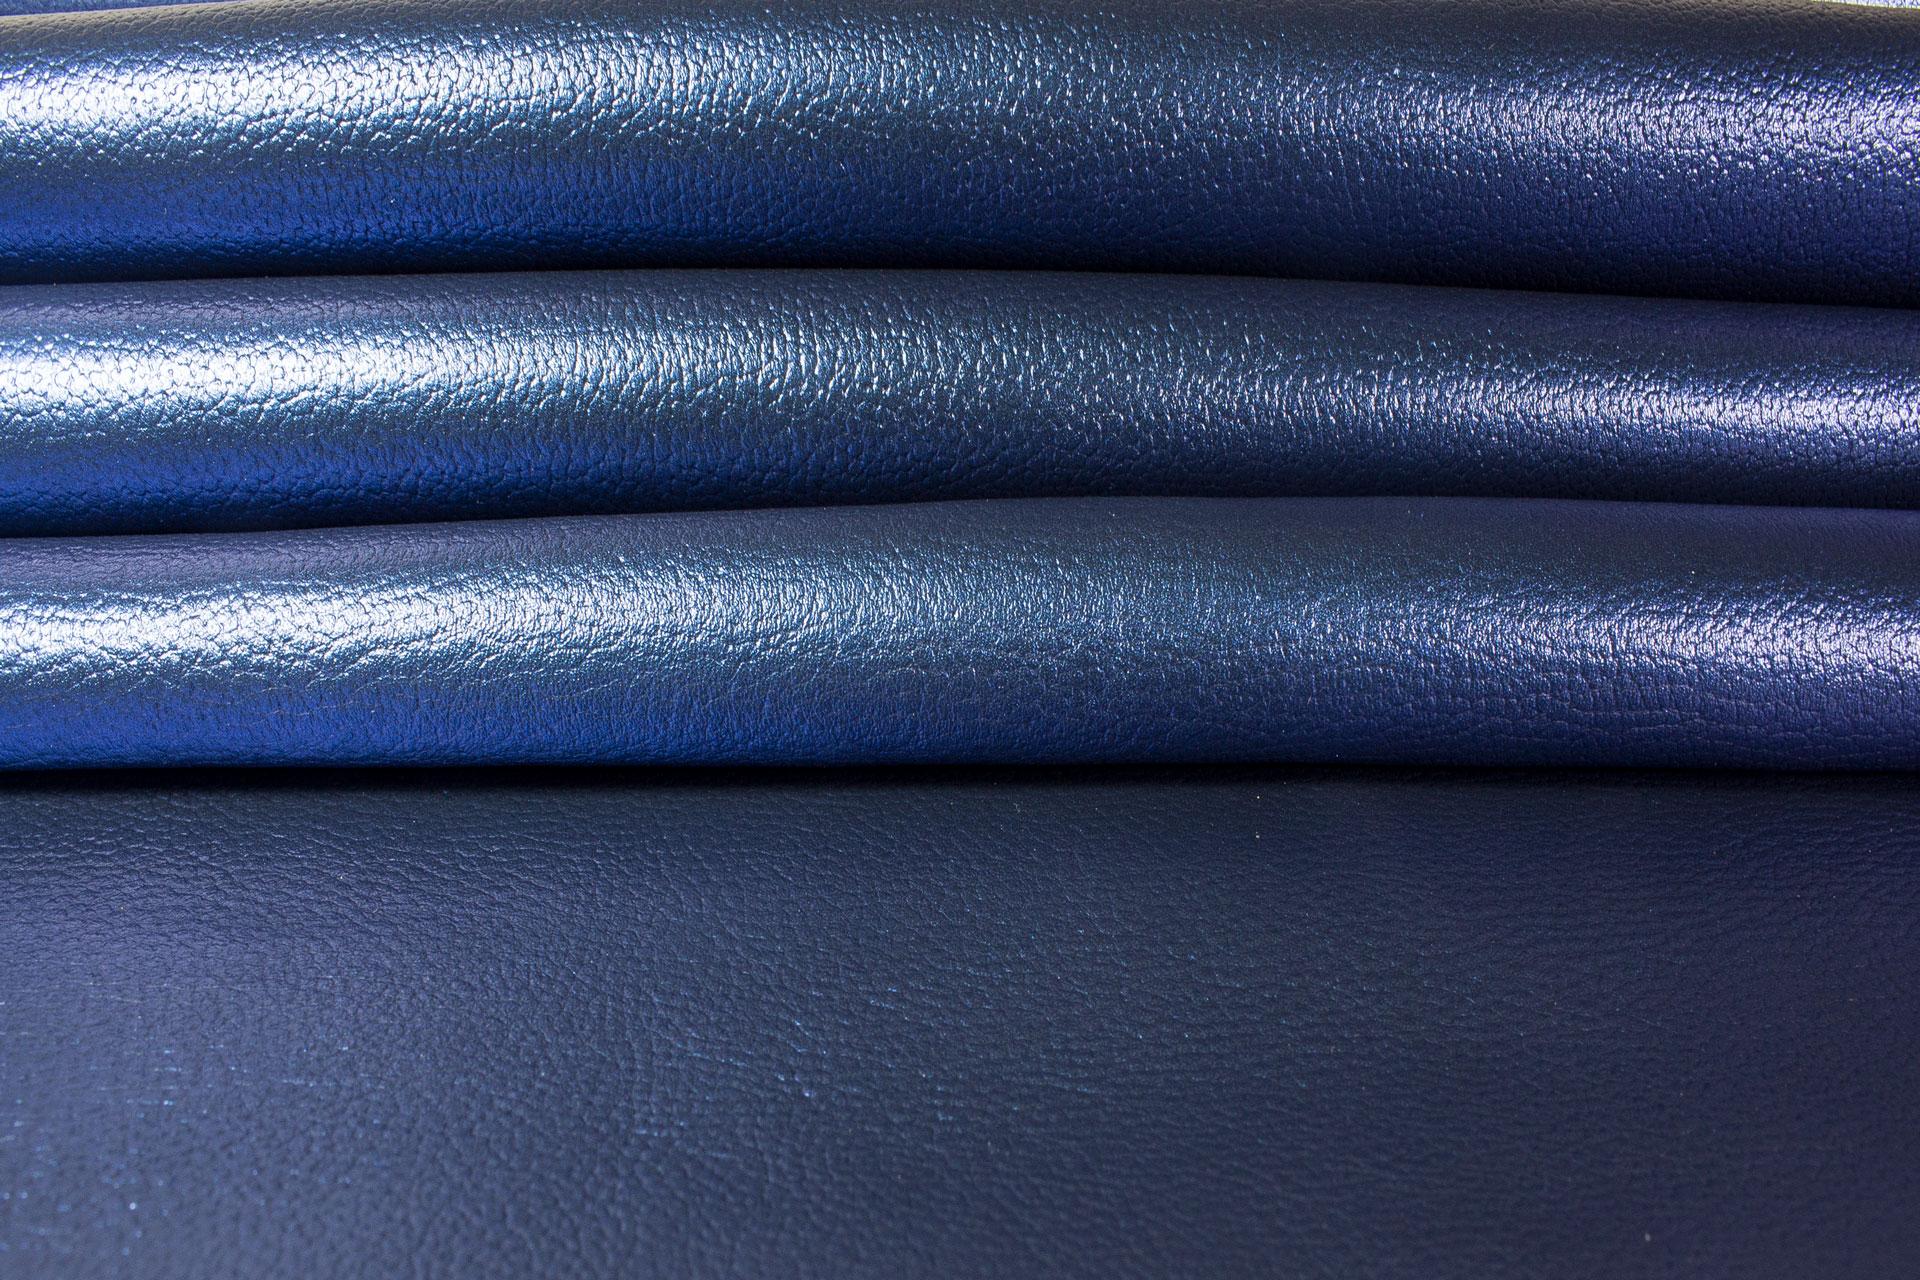 Blue Metallic Leather